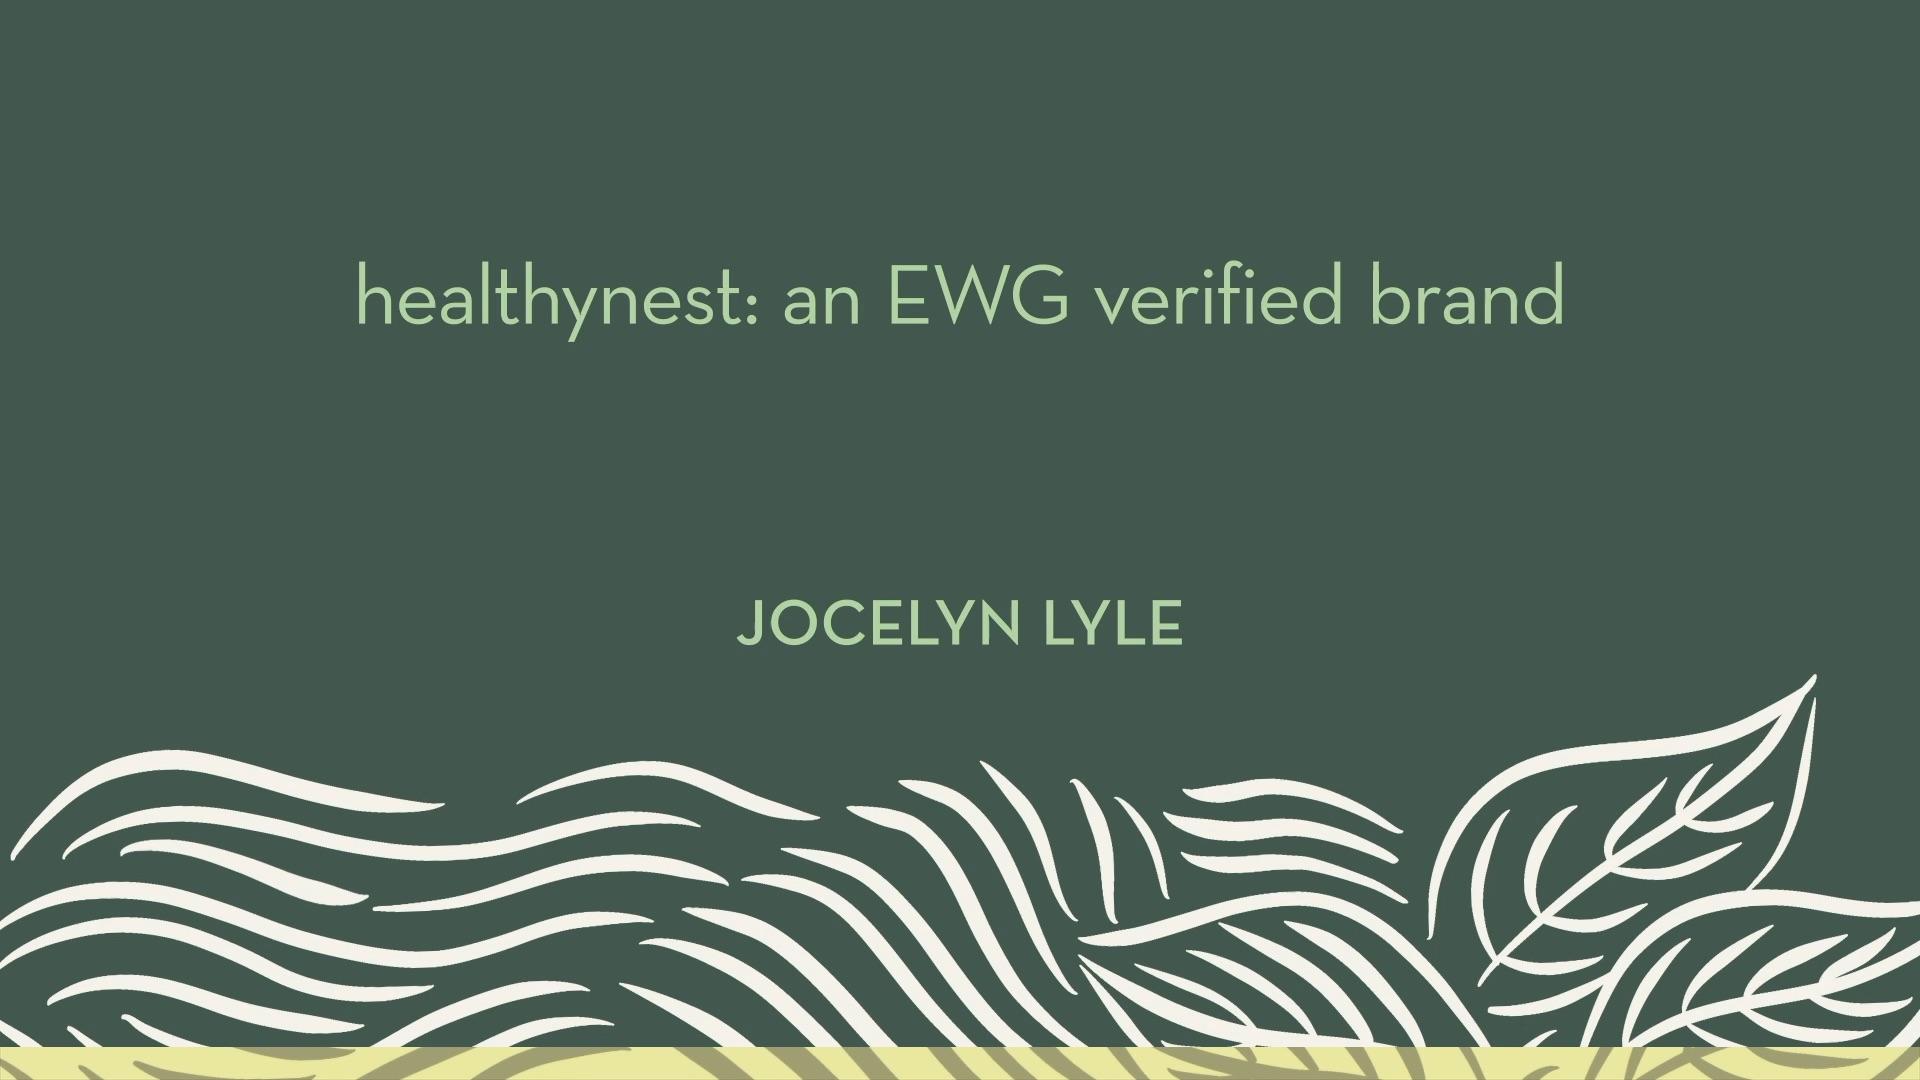 healthynest: an EWG Verified brand